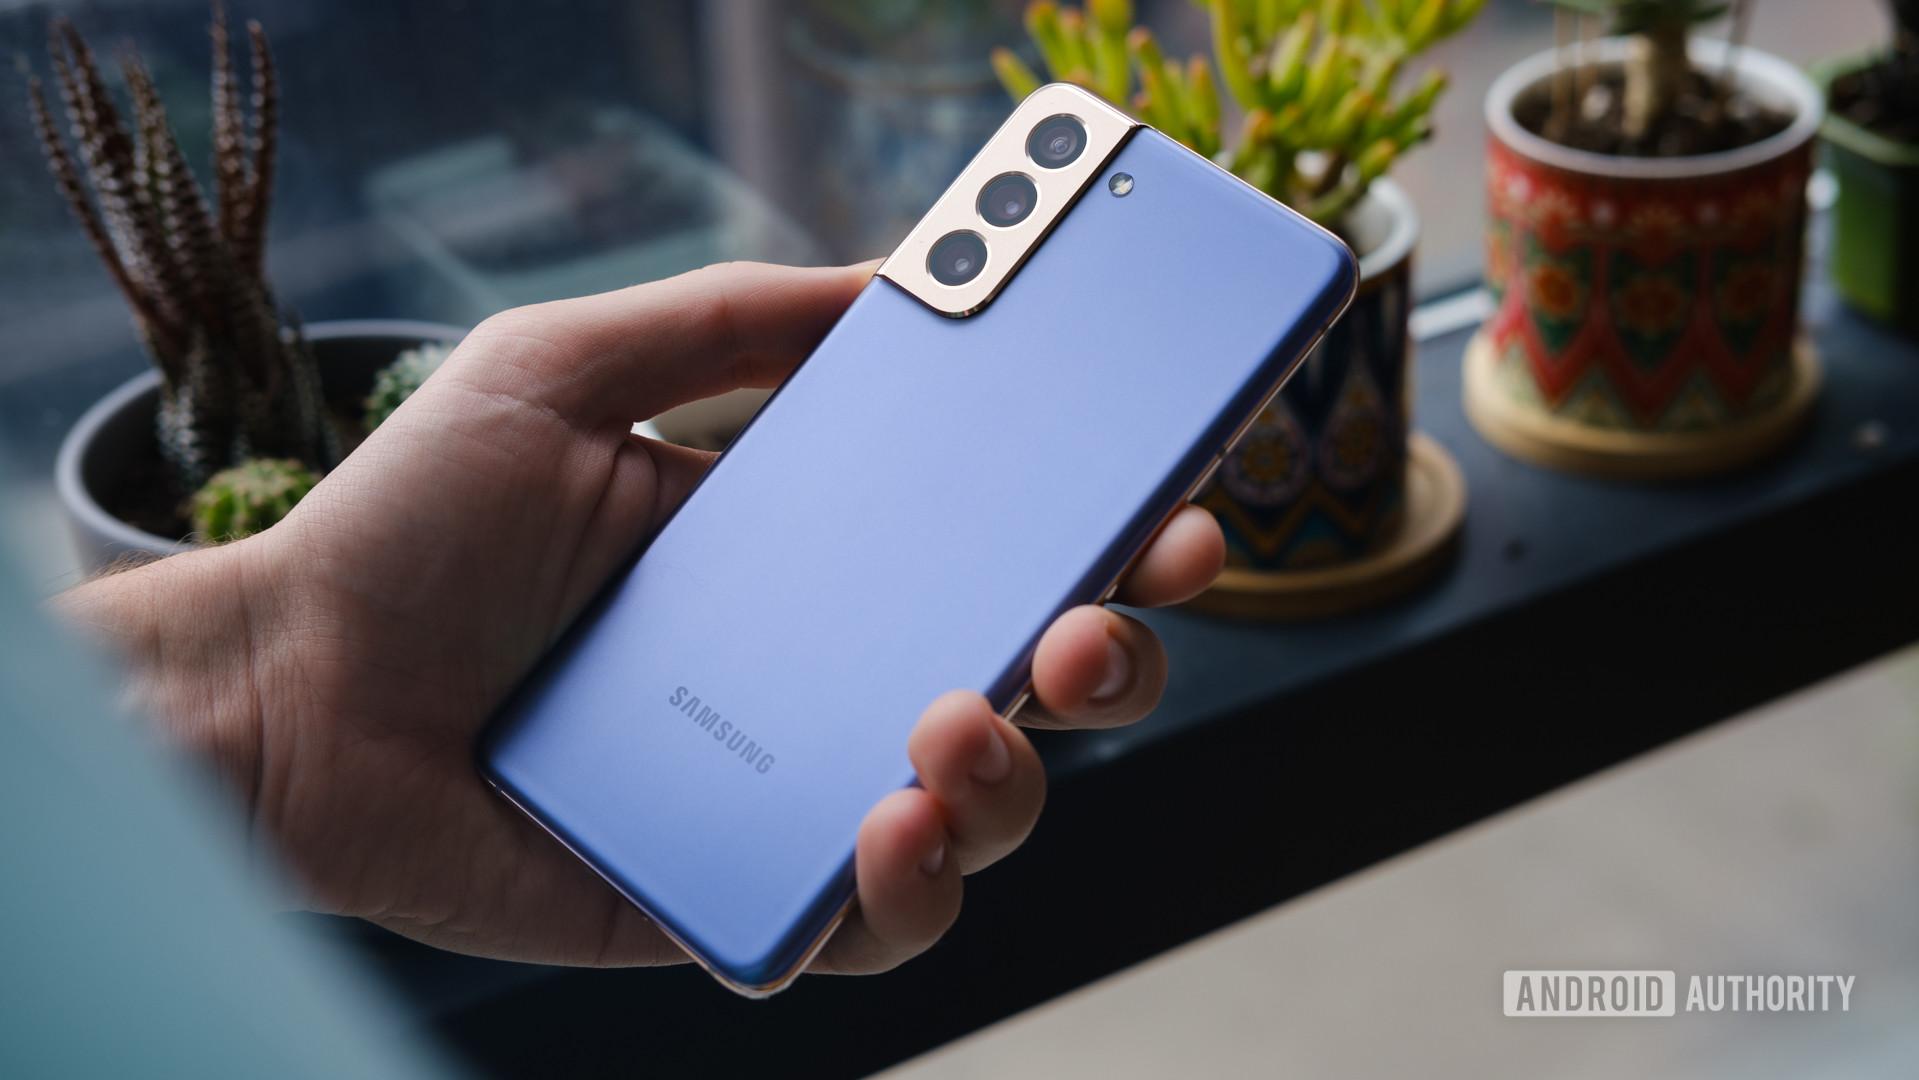 Samsung Galaxy S21 back in hand 1 1